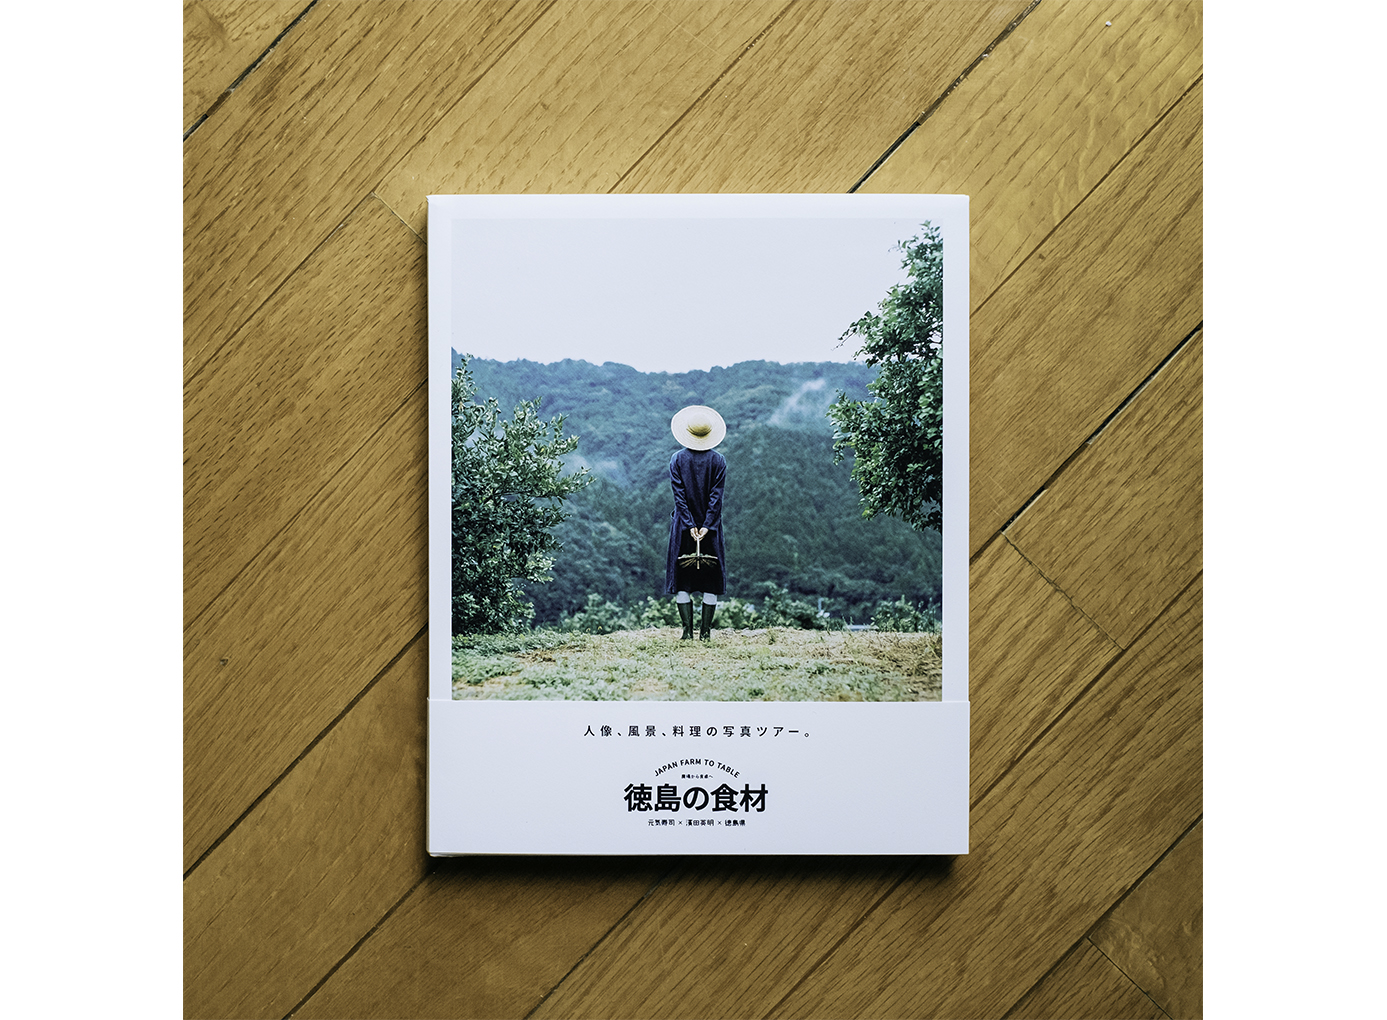 Genki_8.jpg